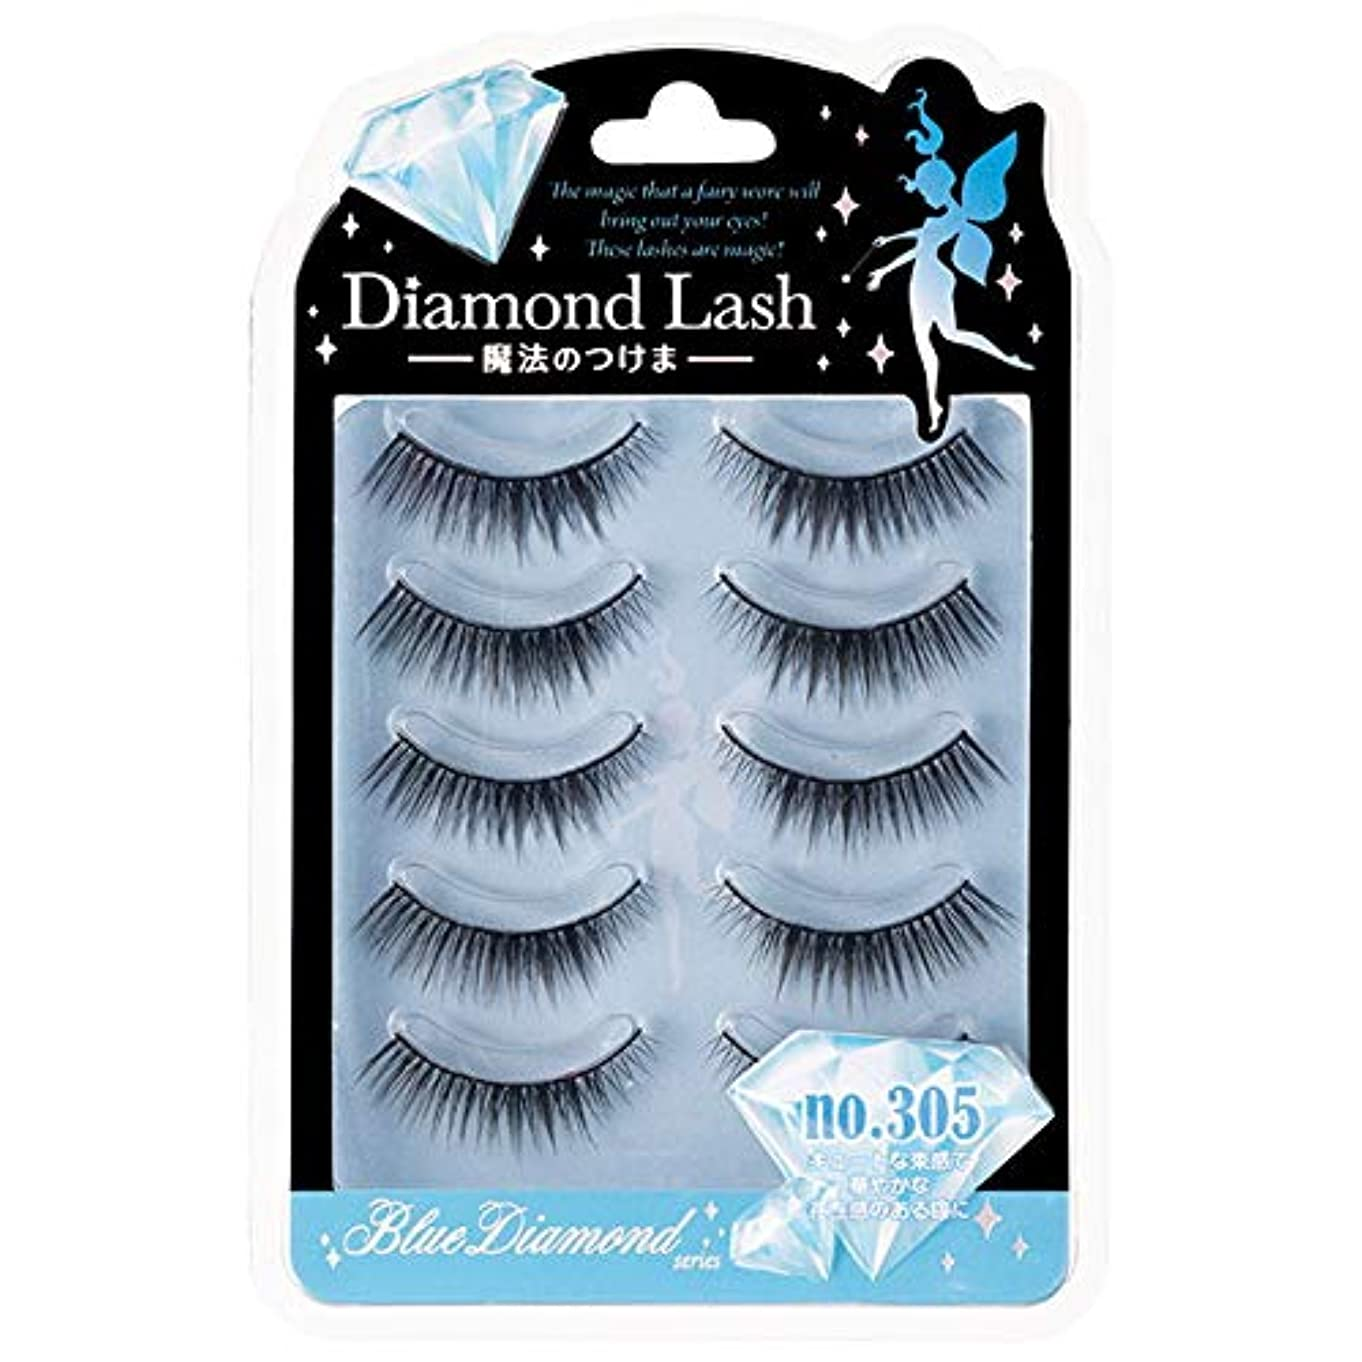 Diamond Lash(ダイヤモンドラッシュ) ブルー no.305 5ペア